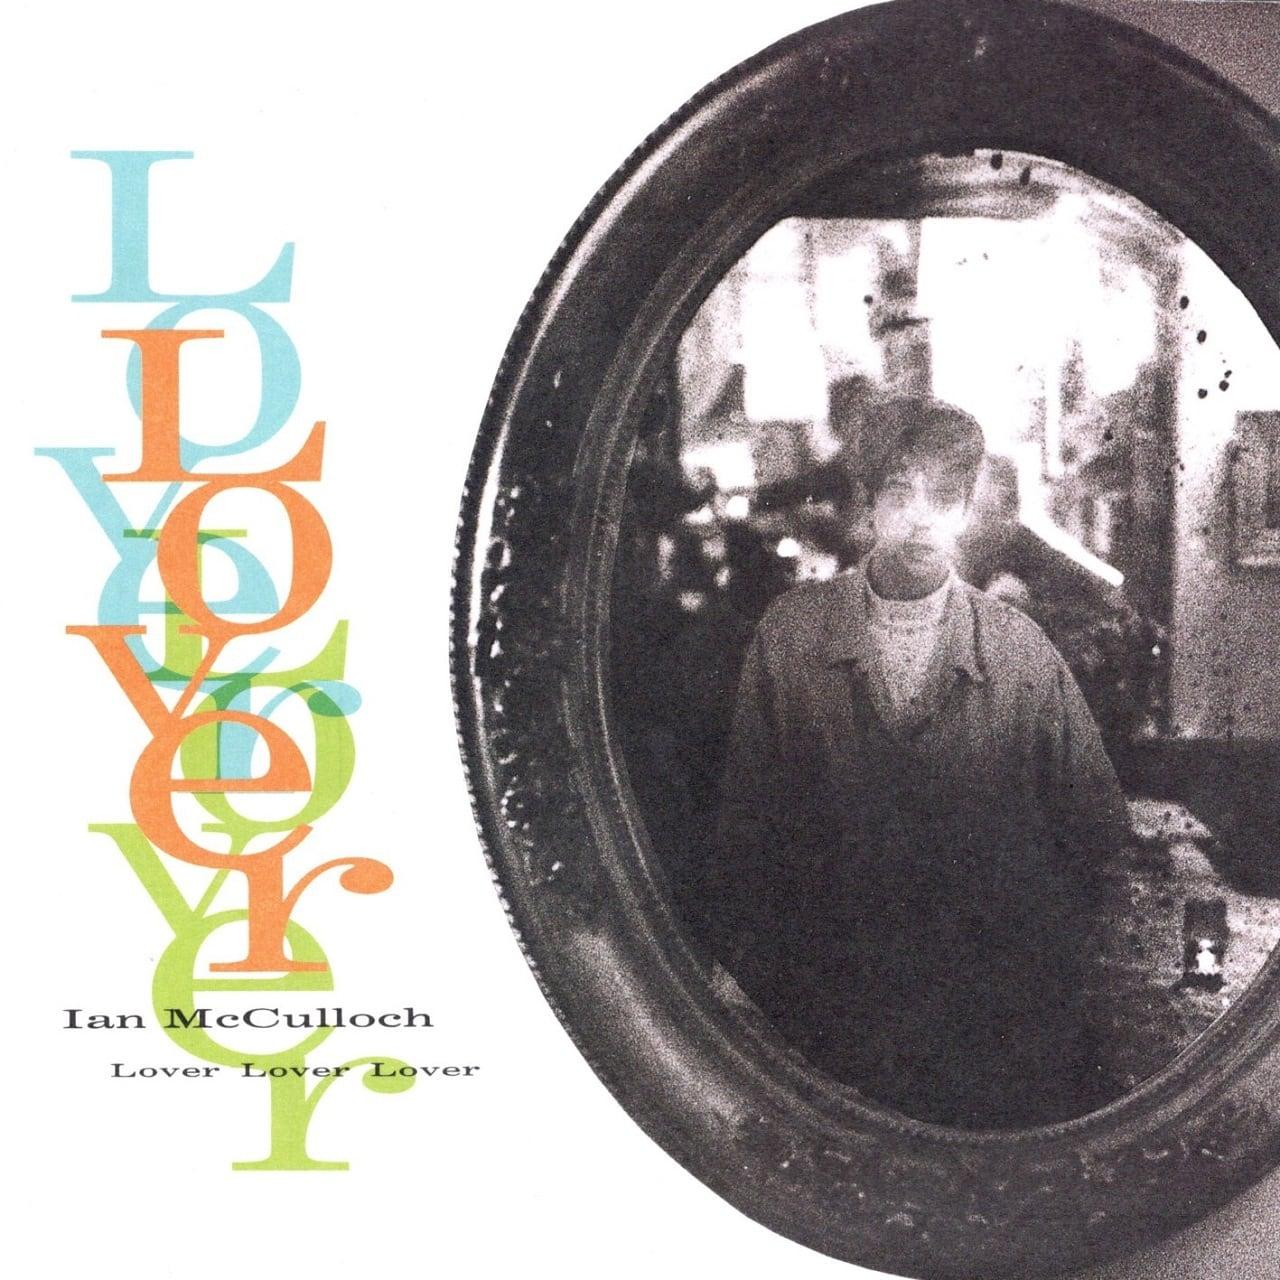 【7inch・英盤】Ian Mcculloch / Lover Lover Lover